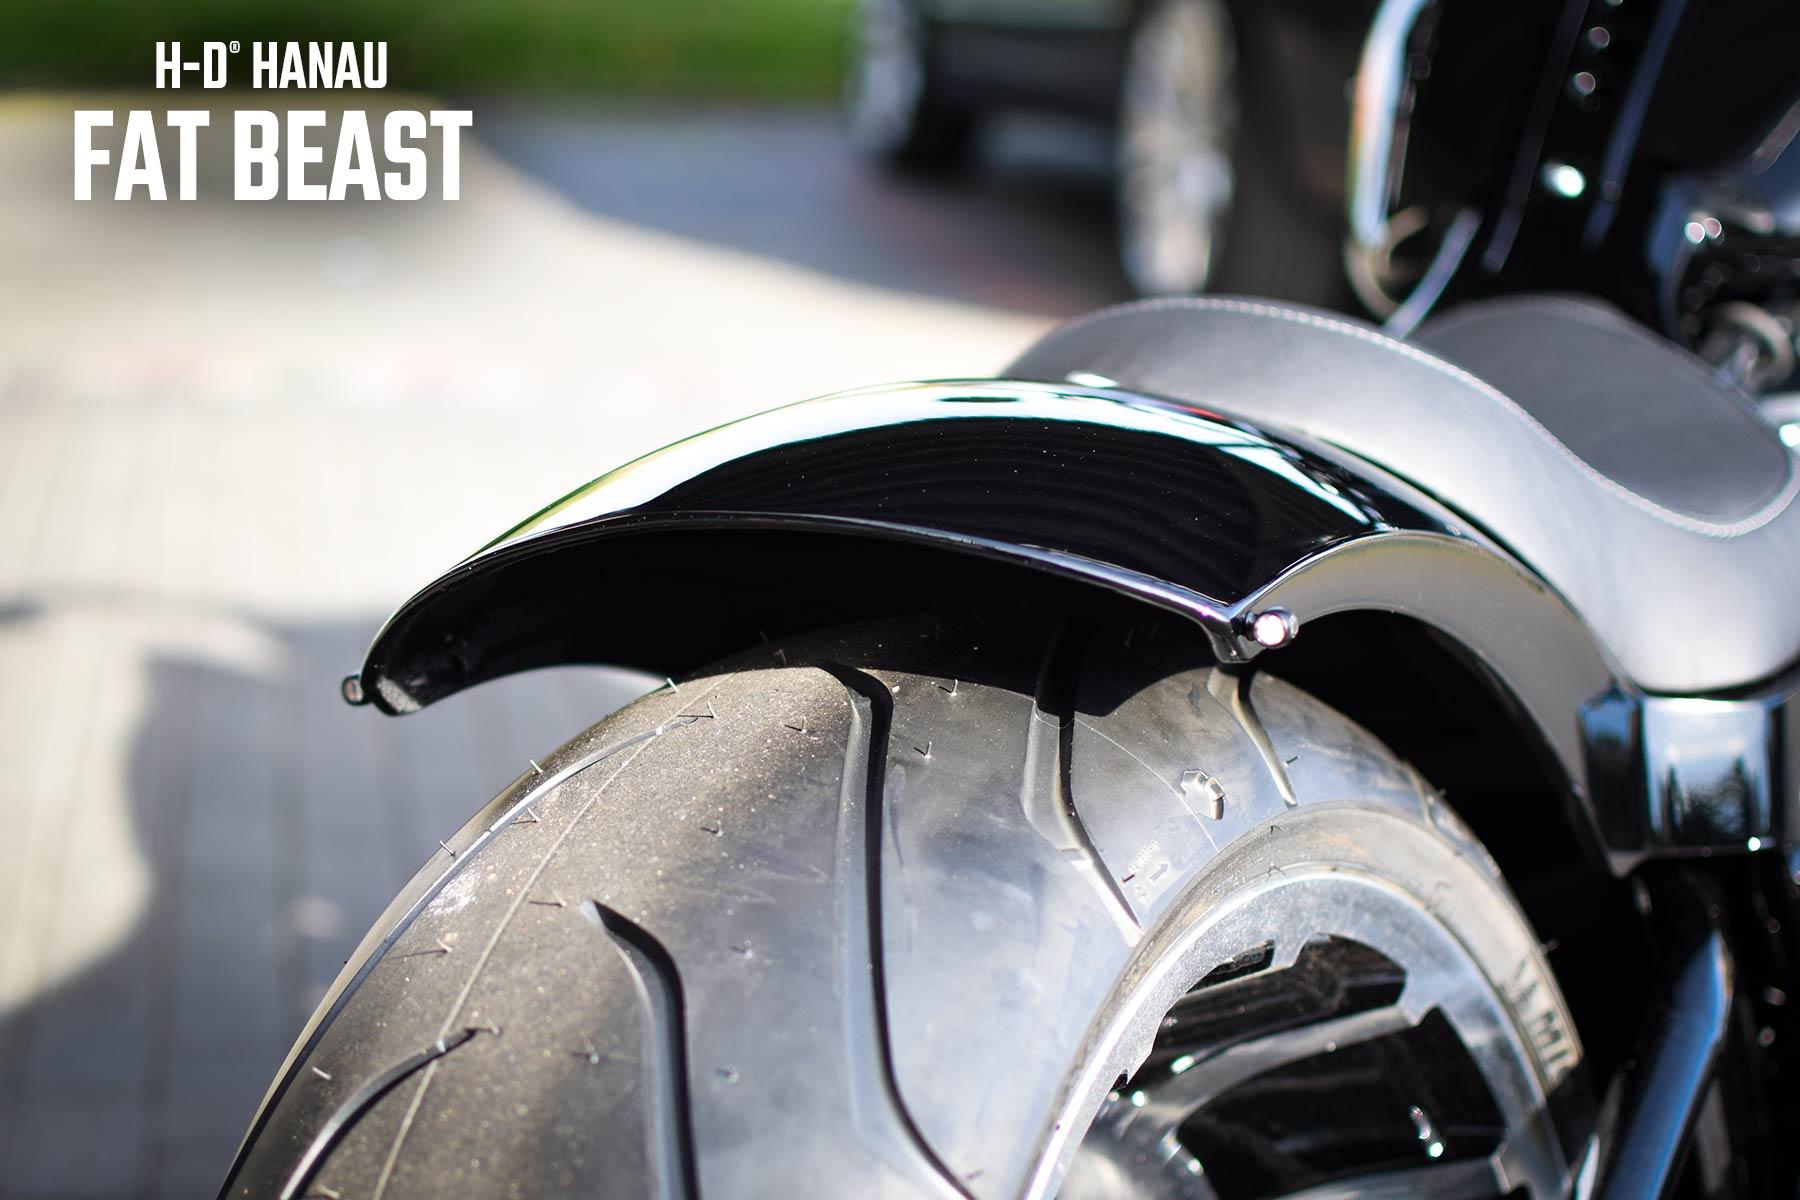 Harley-Davidson Hanau präsentiert Fat Beast Custombike - Umbau auf Fat Boy Basis